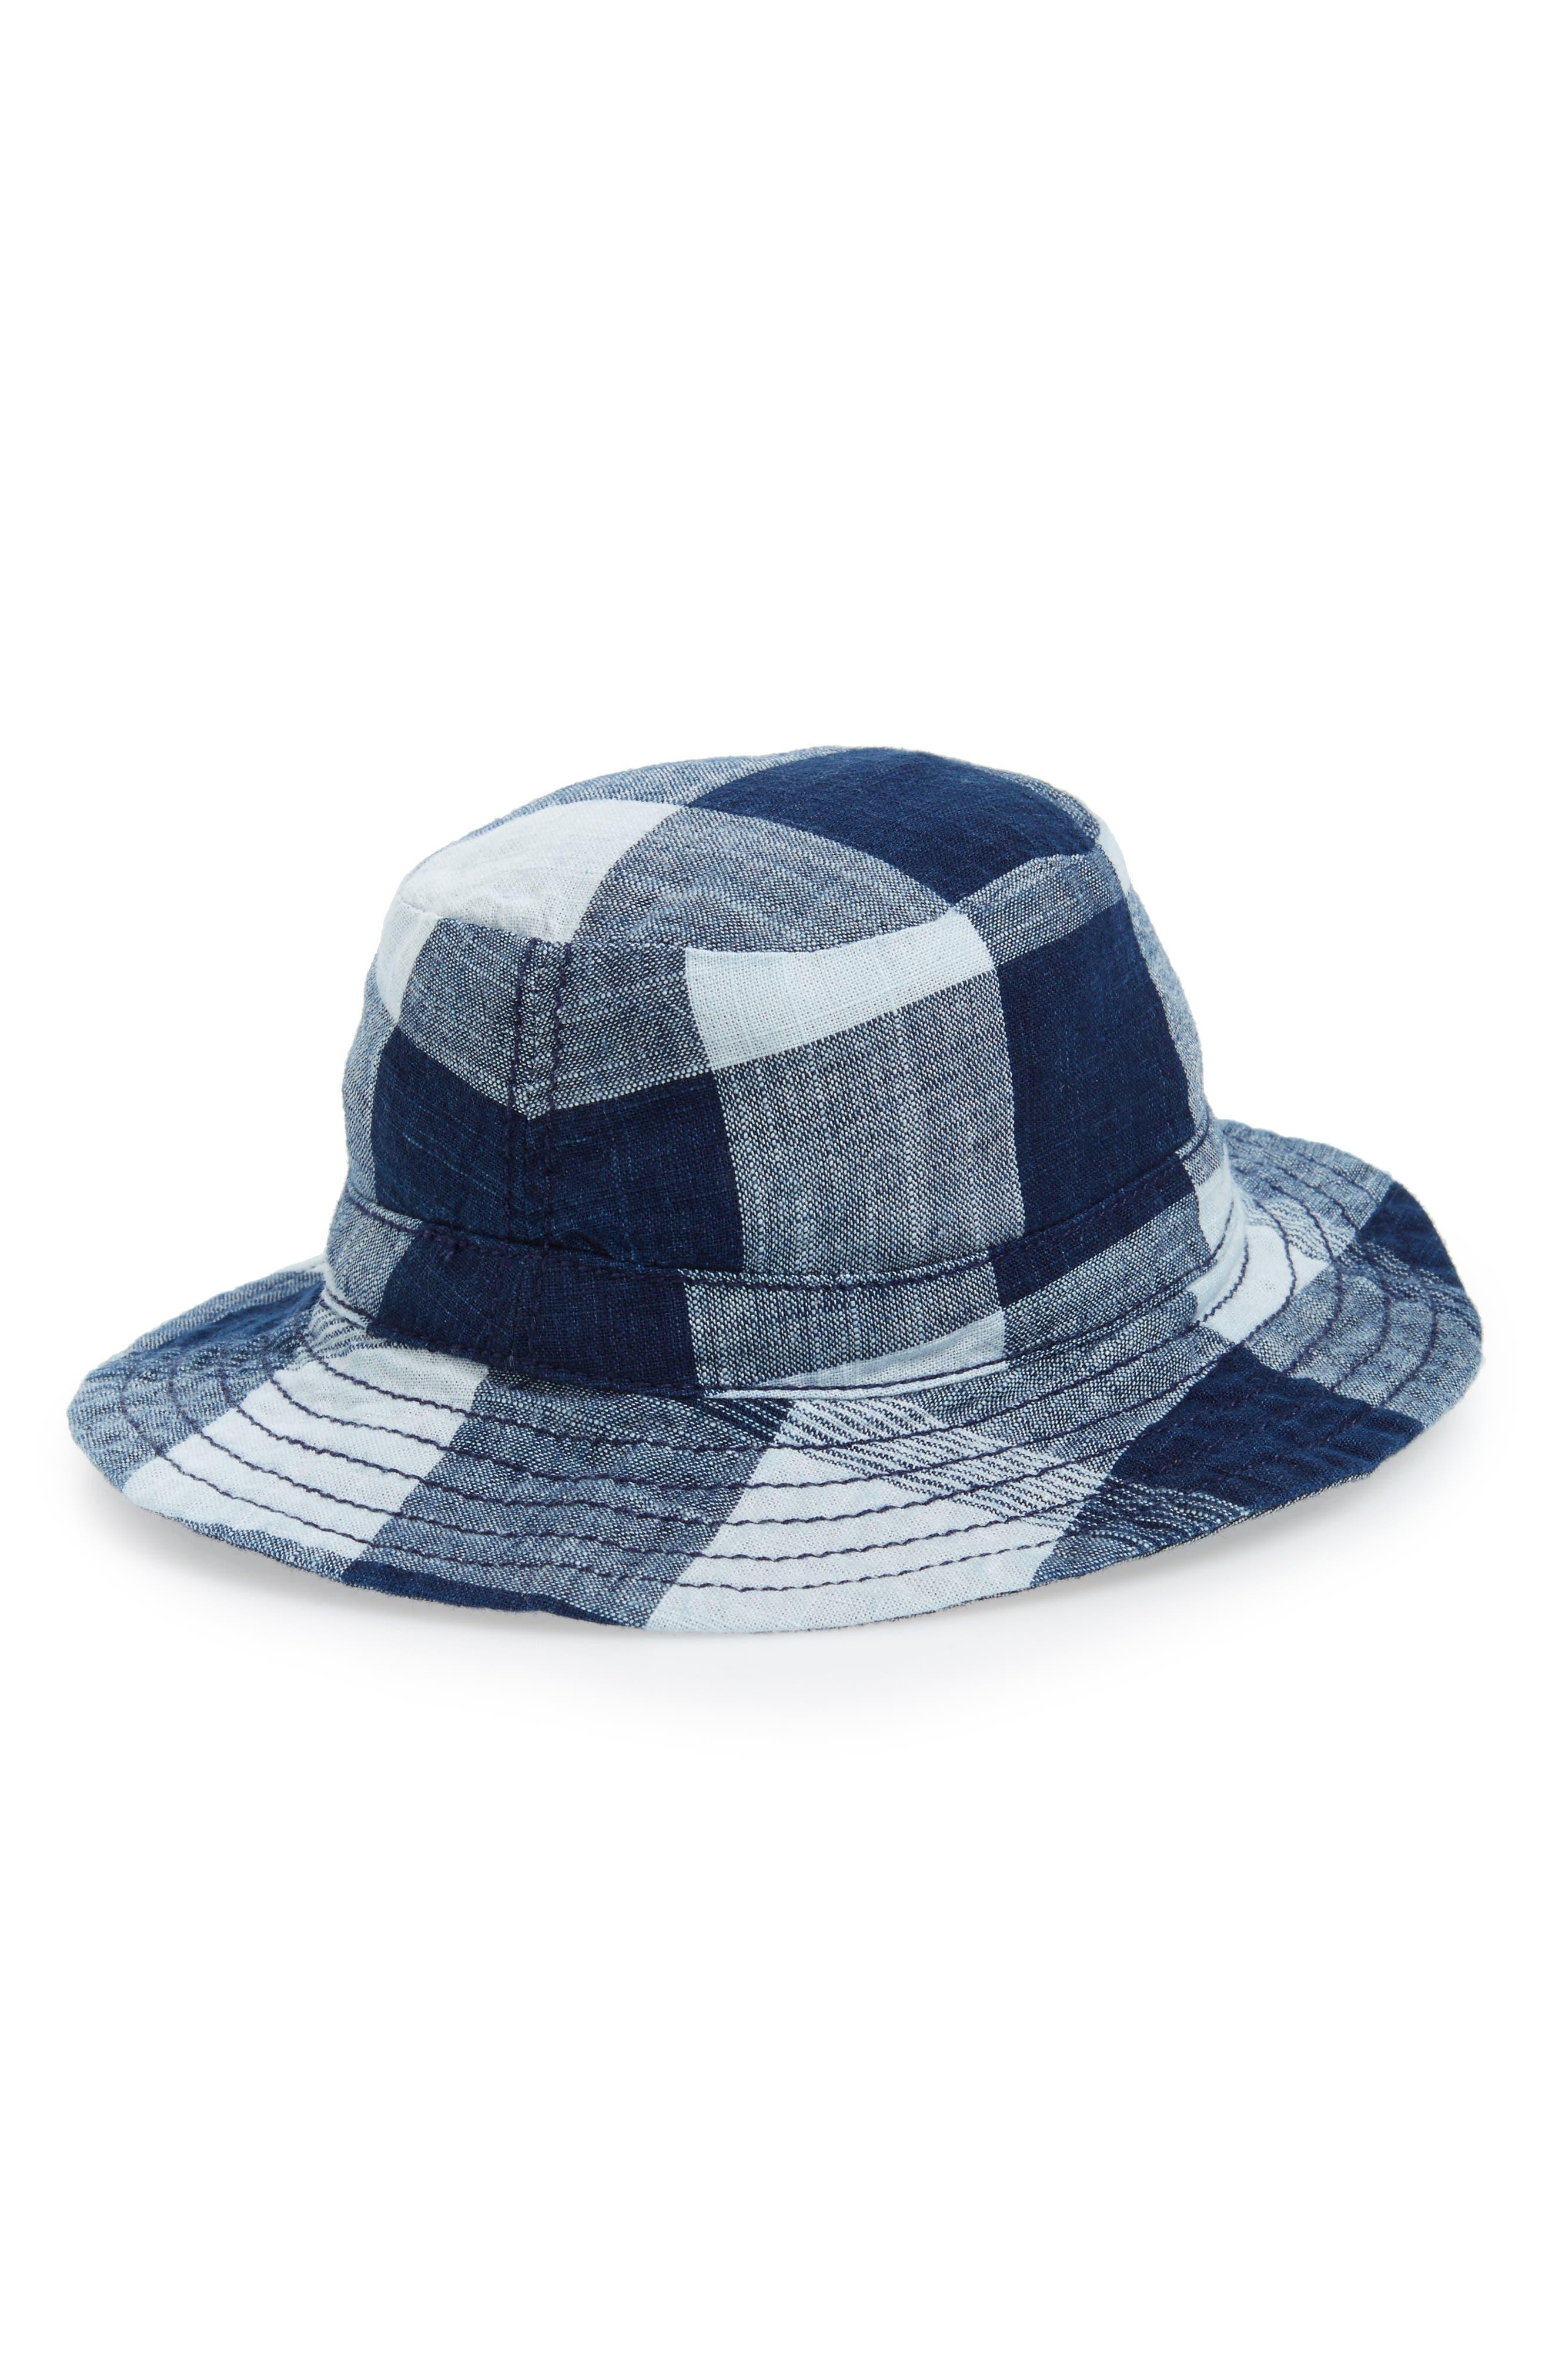 Reversible Bucket Hat,                             Main thumbnail 1, color,                             401